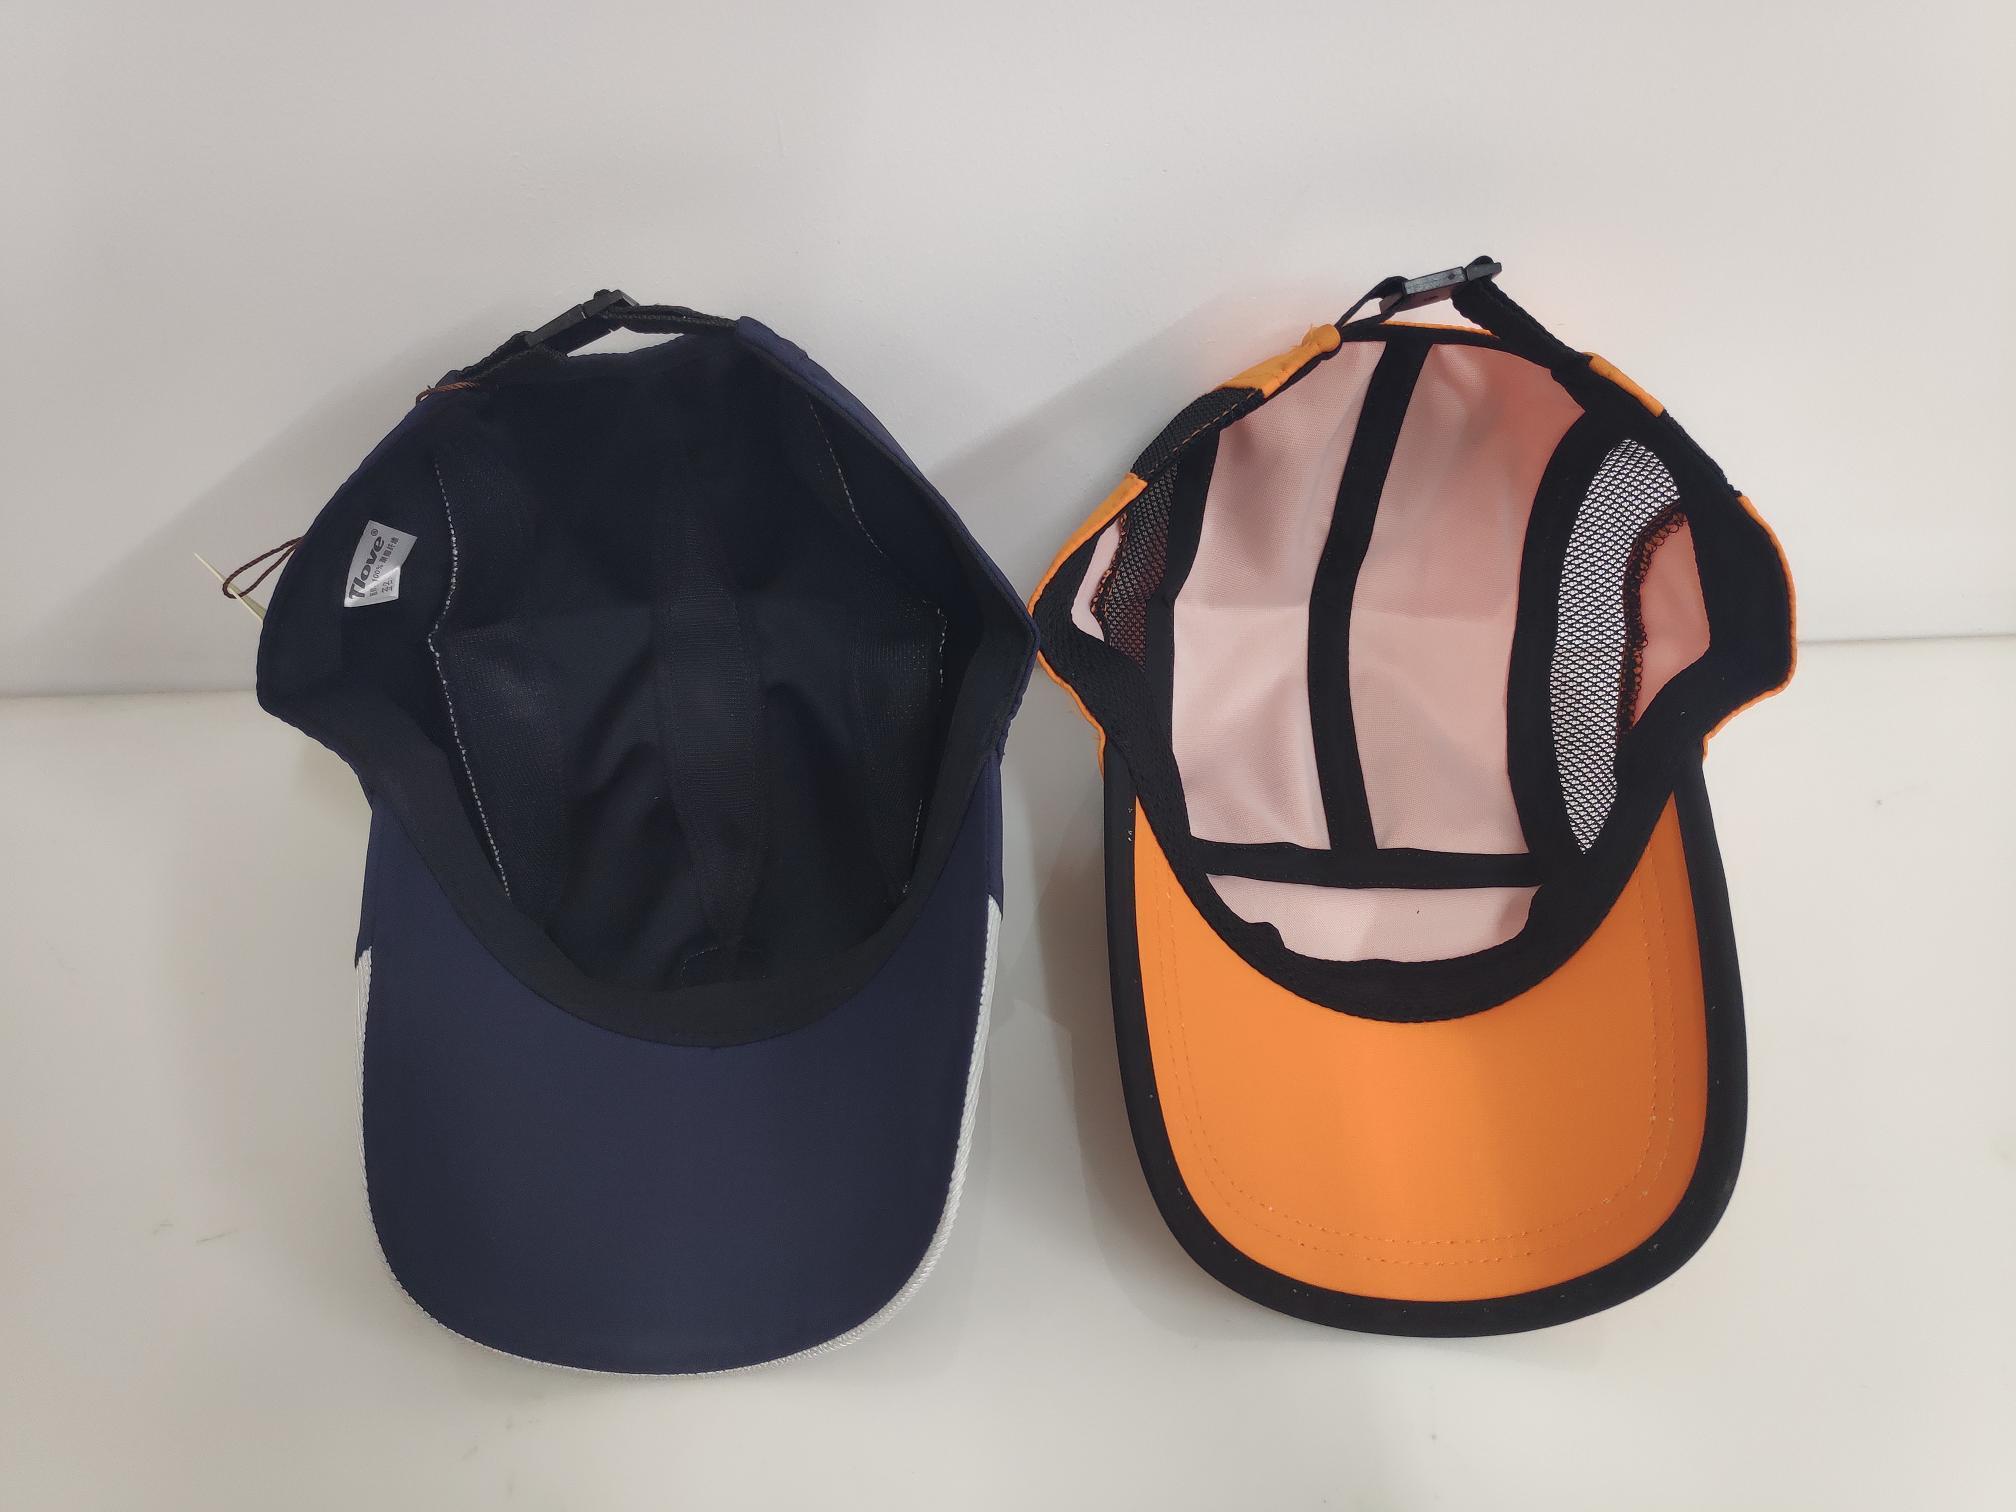 Polyester Micro fiber Jockey 6panel Gorras baseball cap 6